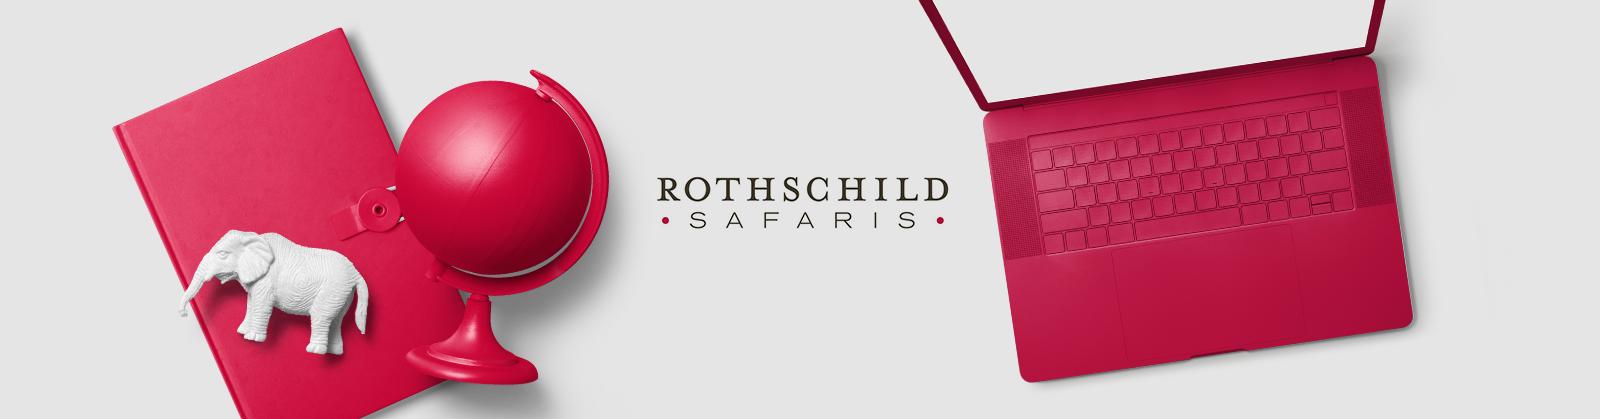 Rothschild-Header-Banner.png